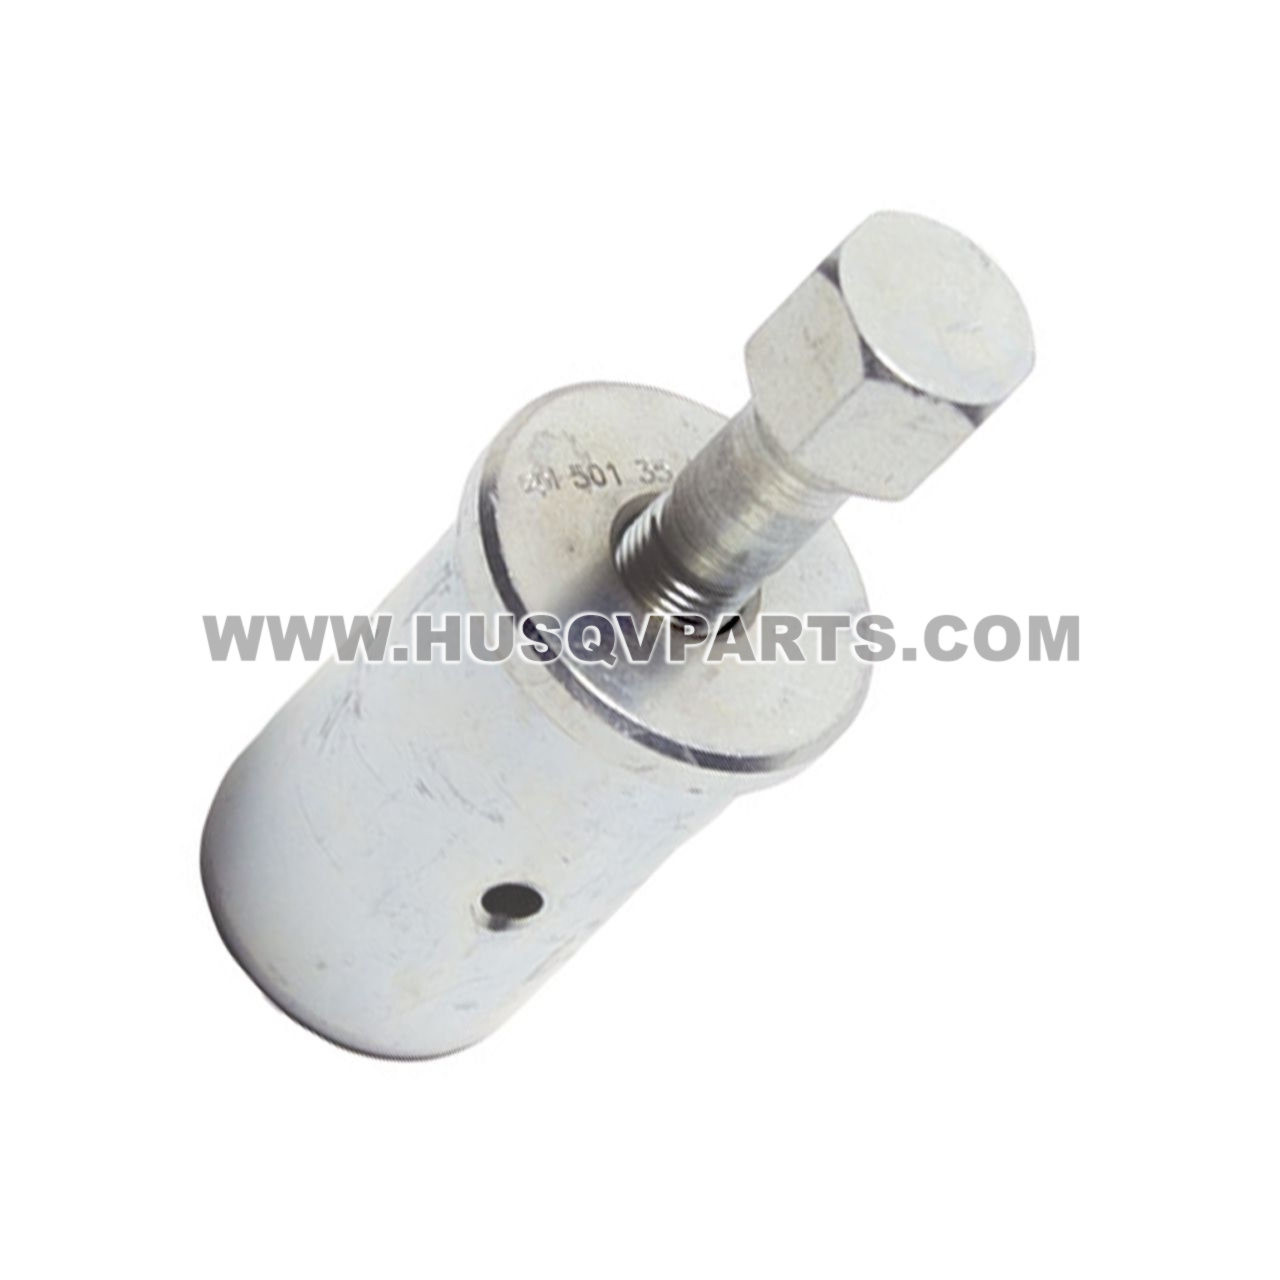 HUSQVARNA Puller Clutch Drum 501354701 Image 1